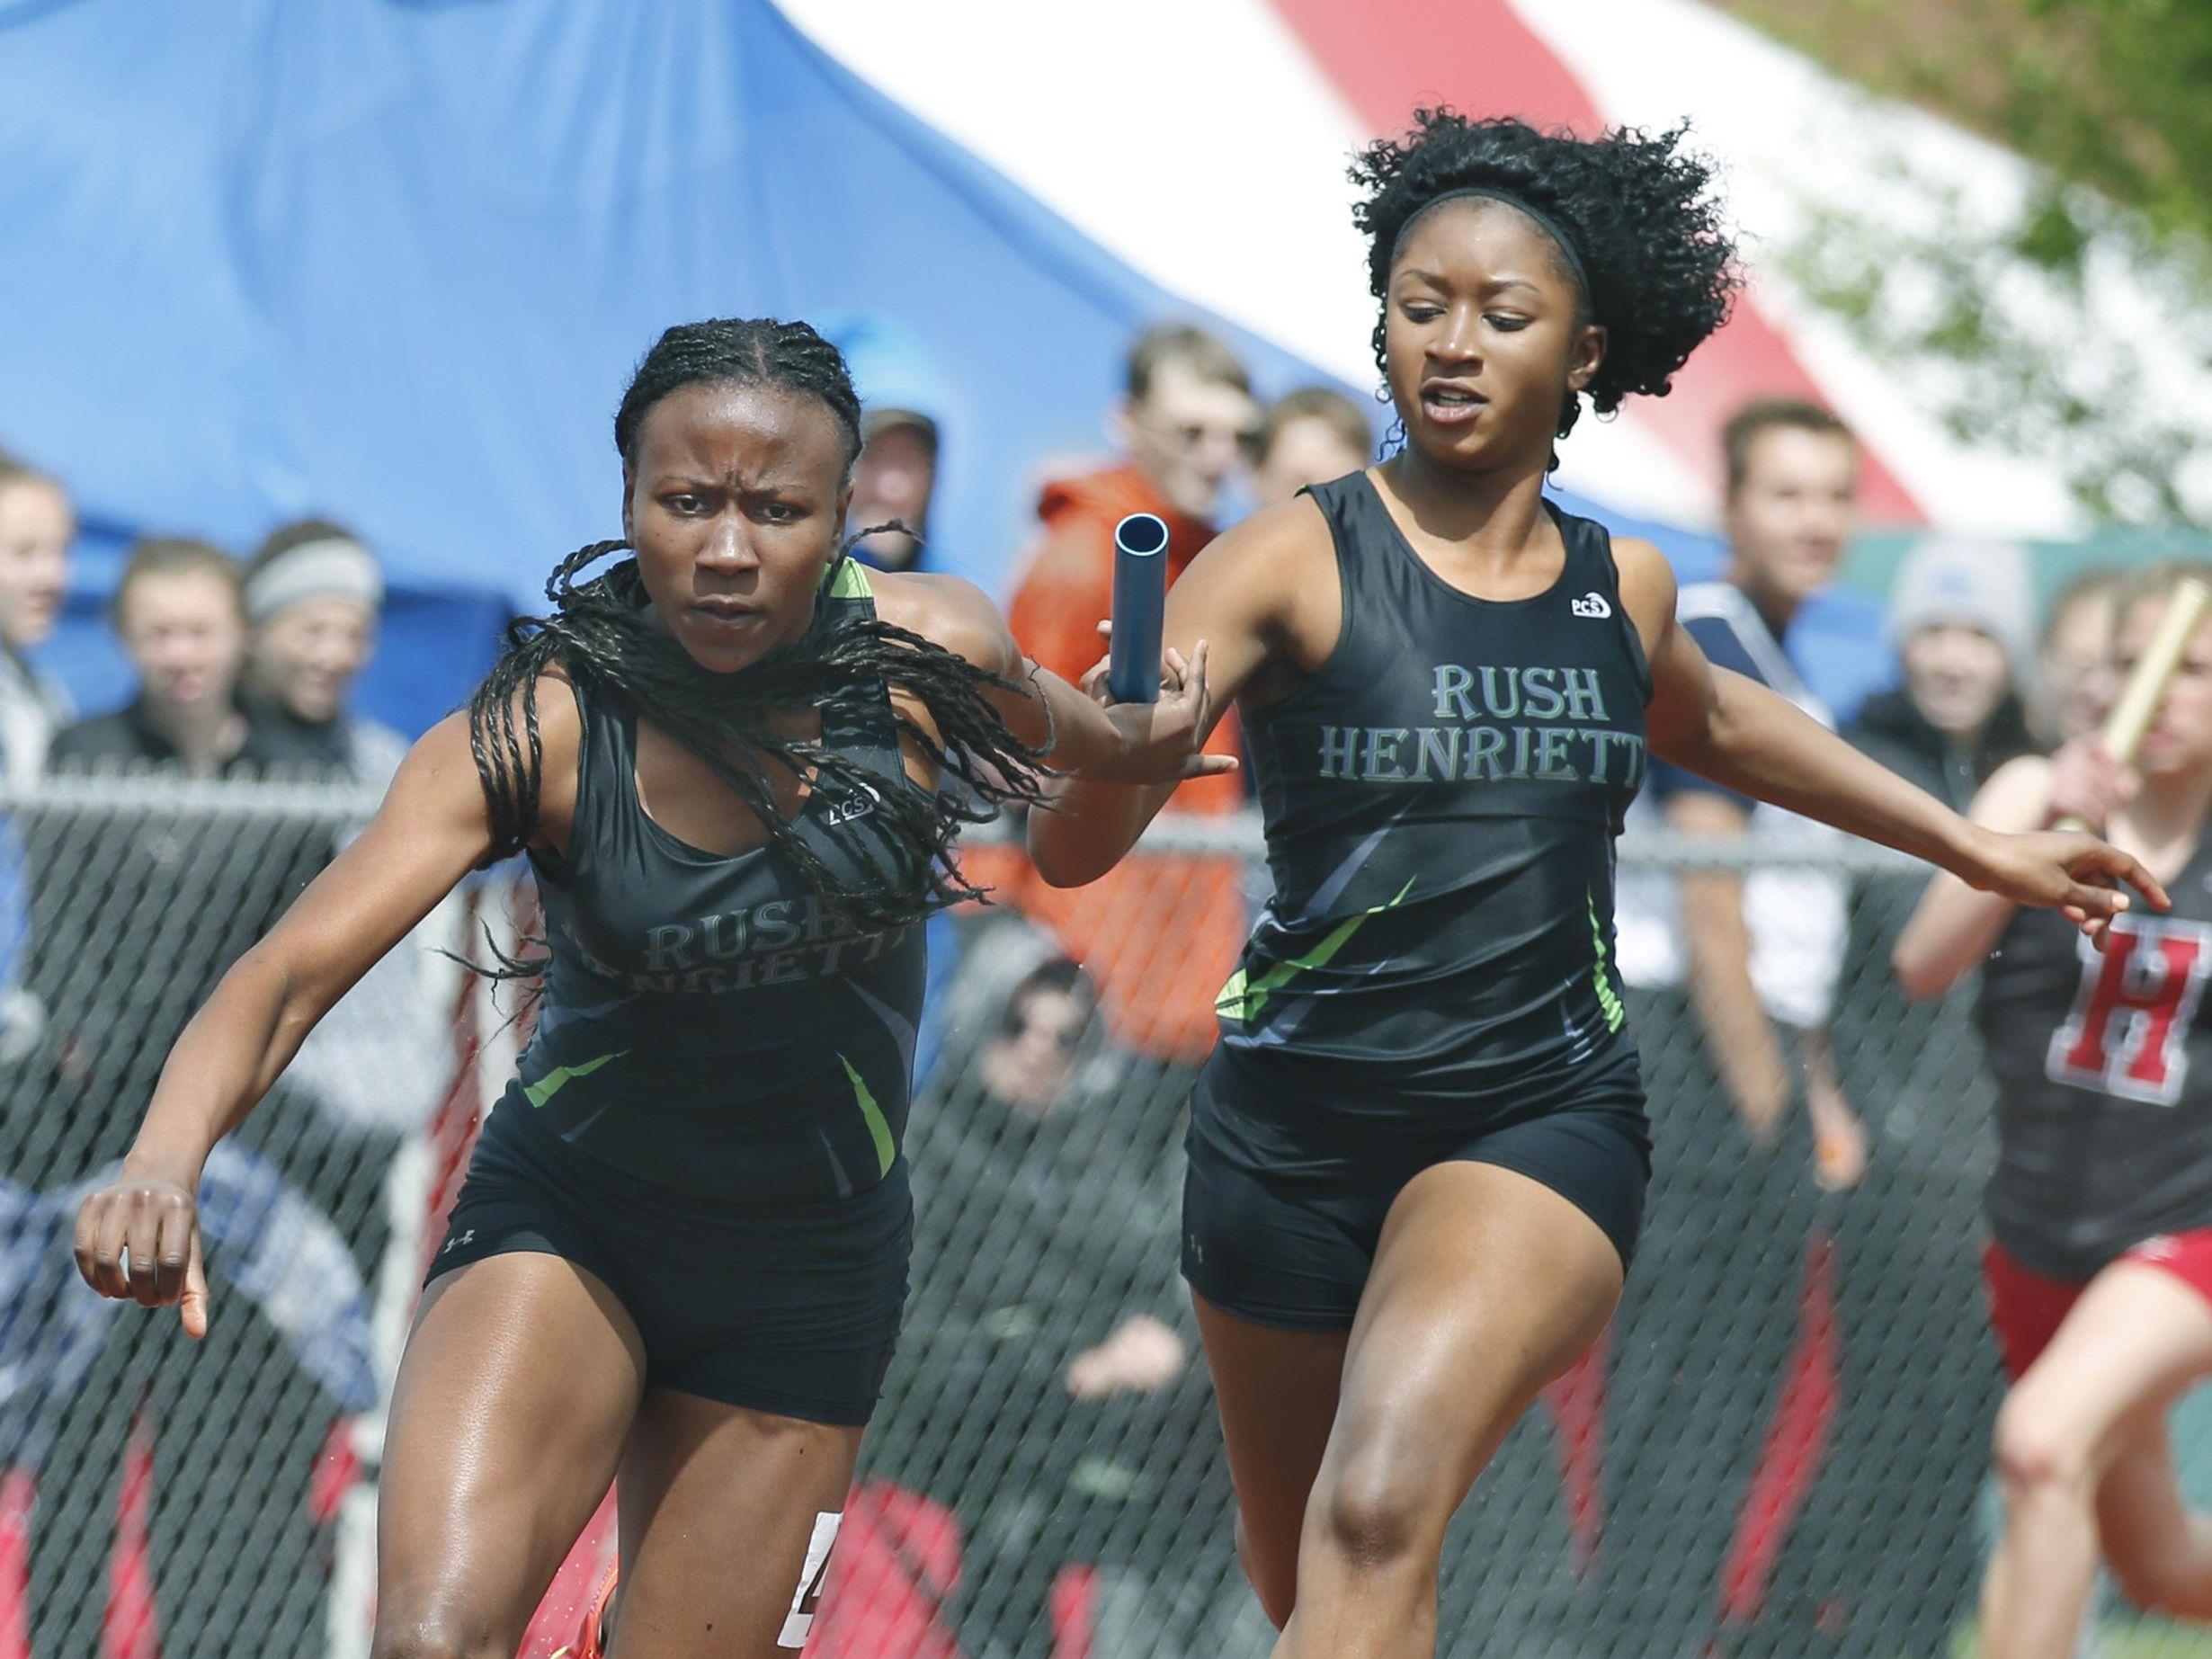 Rush-Henrietta's Lanae-Tava Thomas takes the baton from Adama Donzo to win the 4 x 100 meter relay during the Royal Comet Invitational at Rush-Henrietta High School.